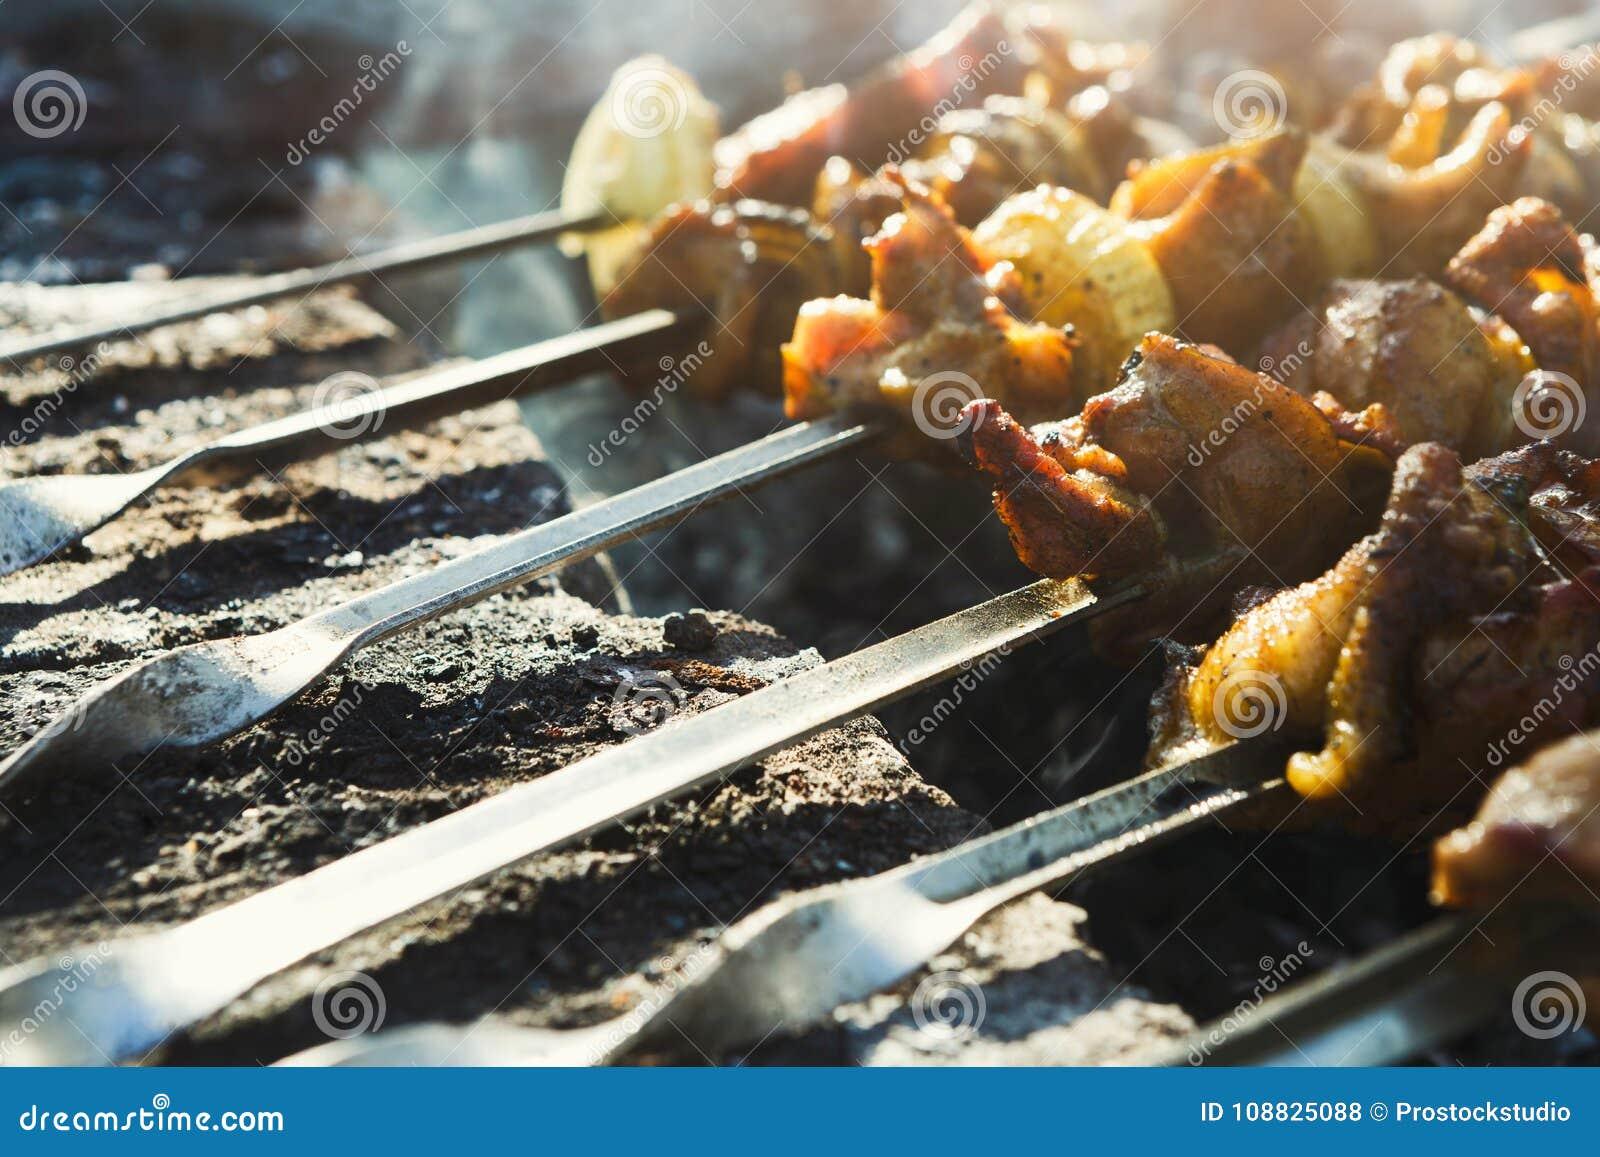 Het festival van het straat snelle voedsel, rundvlees en kippenkebab bij grill